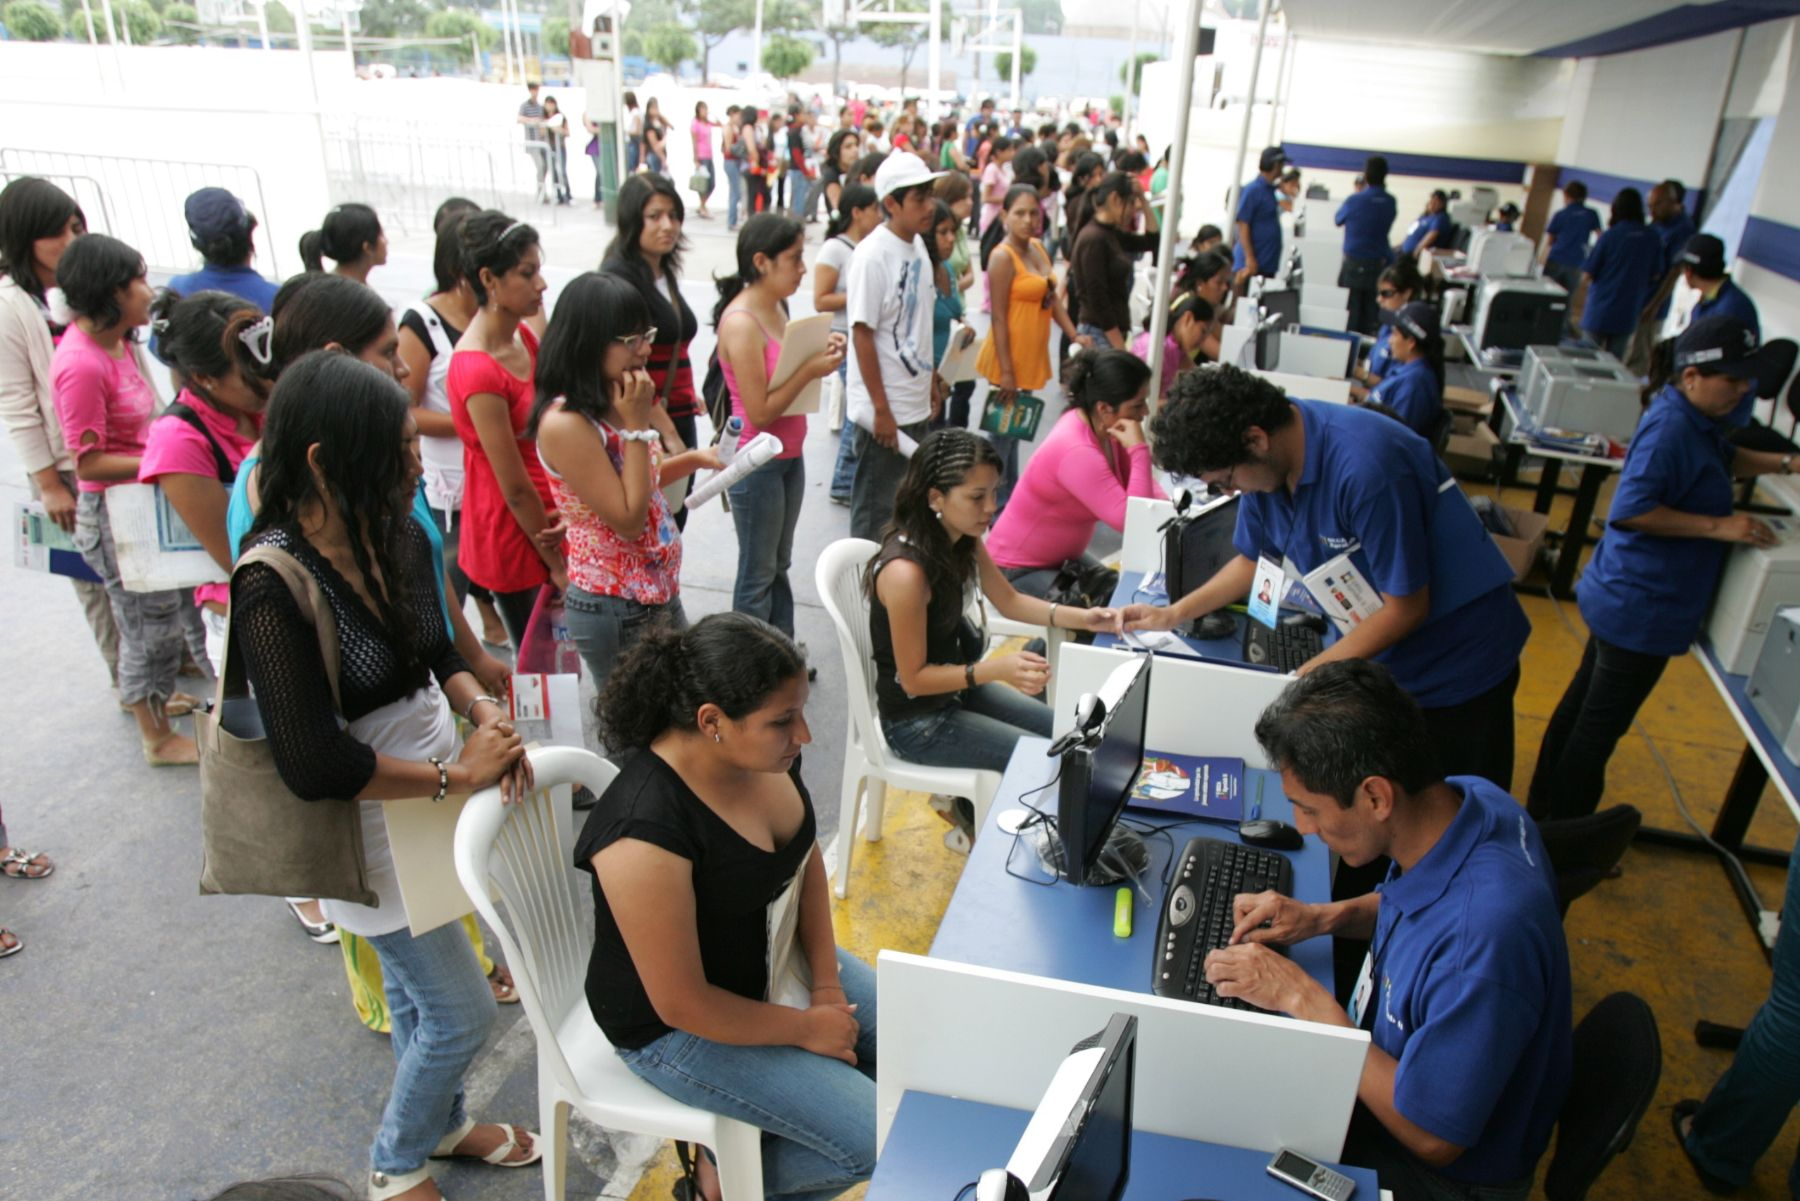 Mañana vence plazo para postular a más de mil becas, informó la OBEC. ANDINA/Rubén Grández